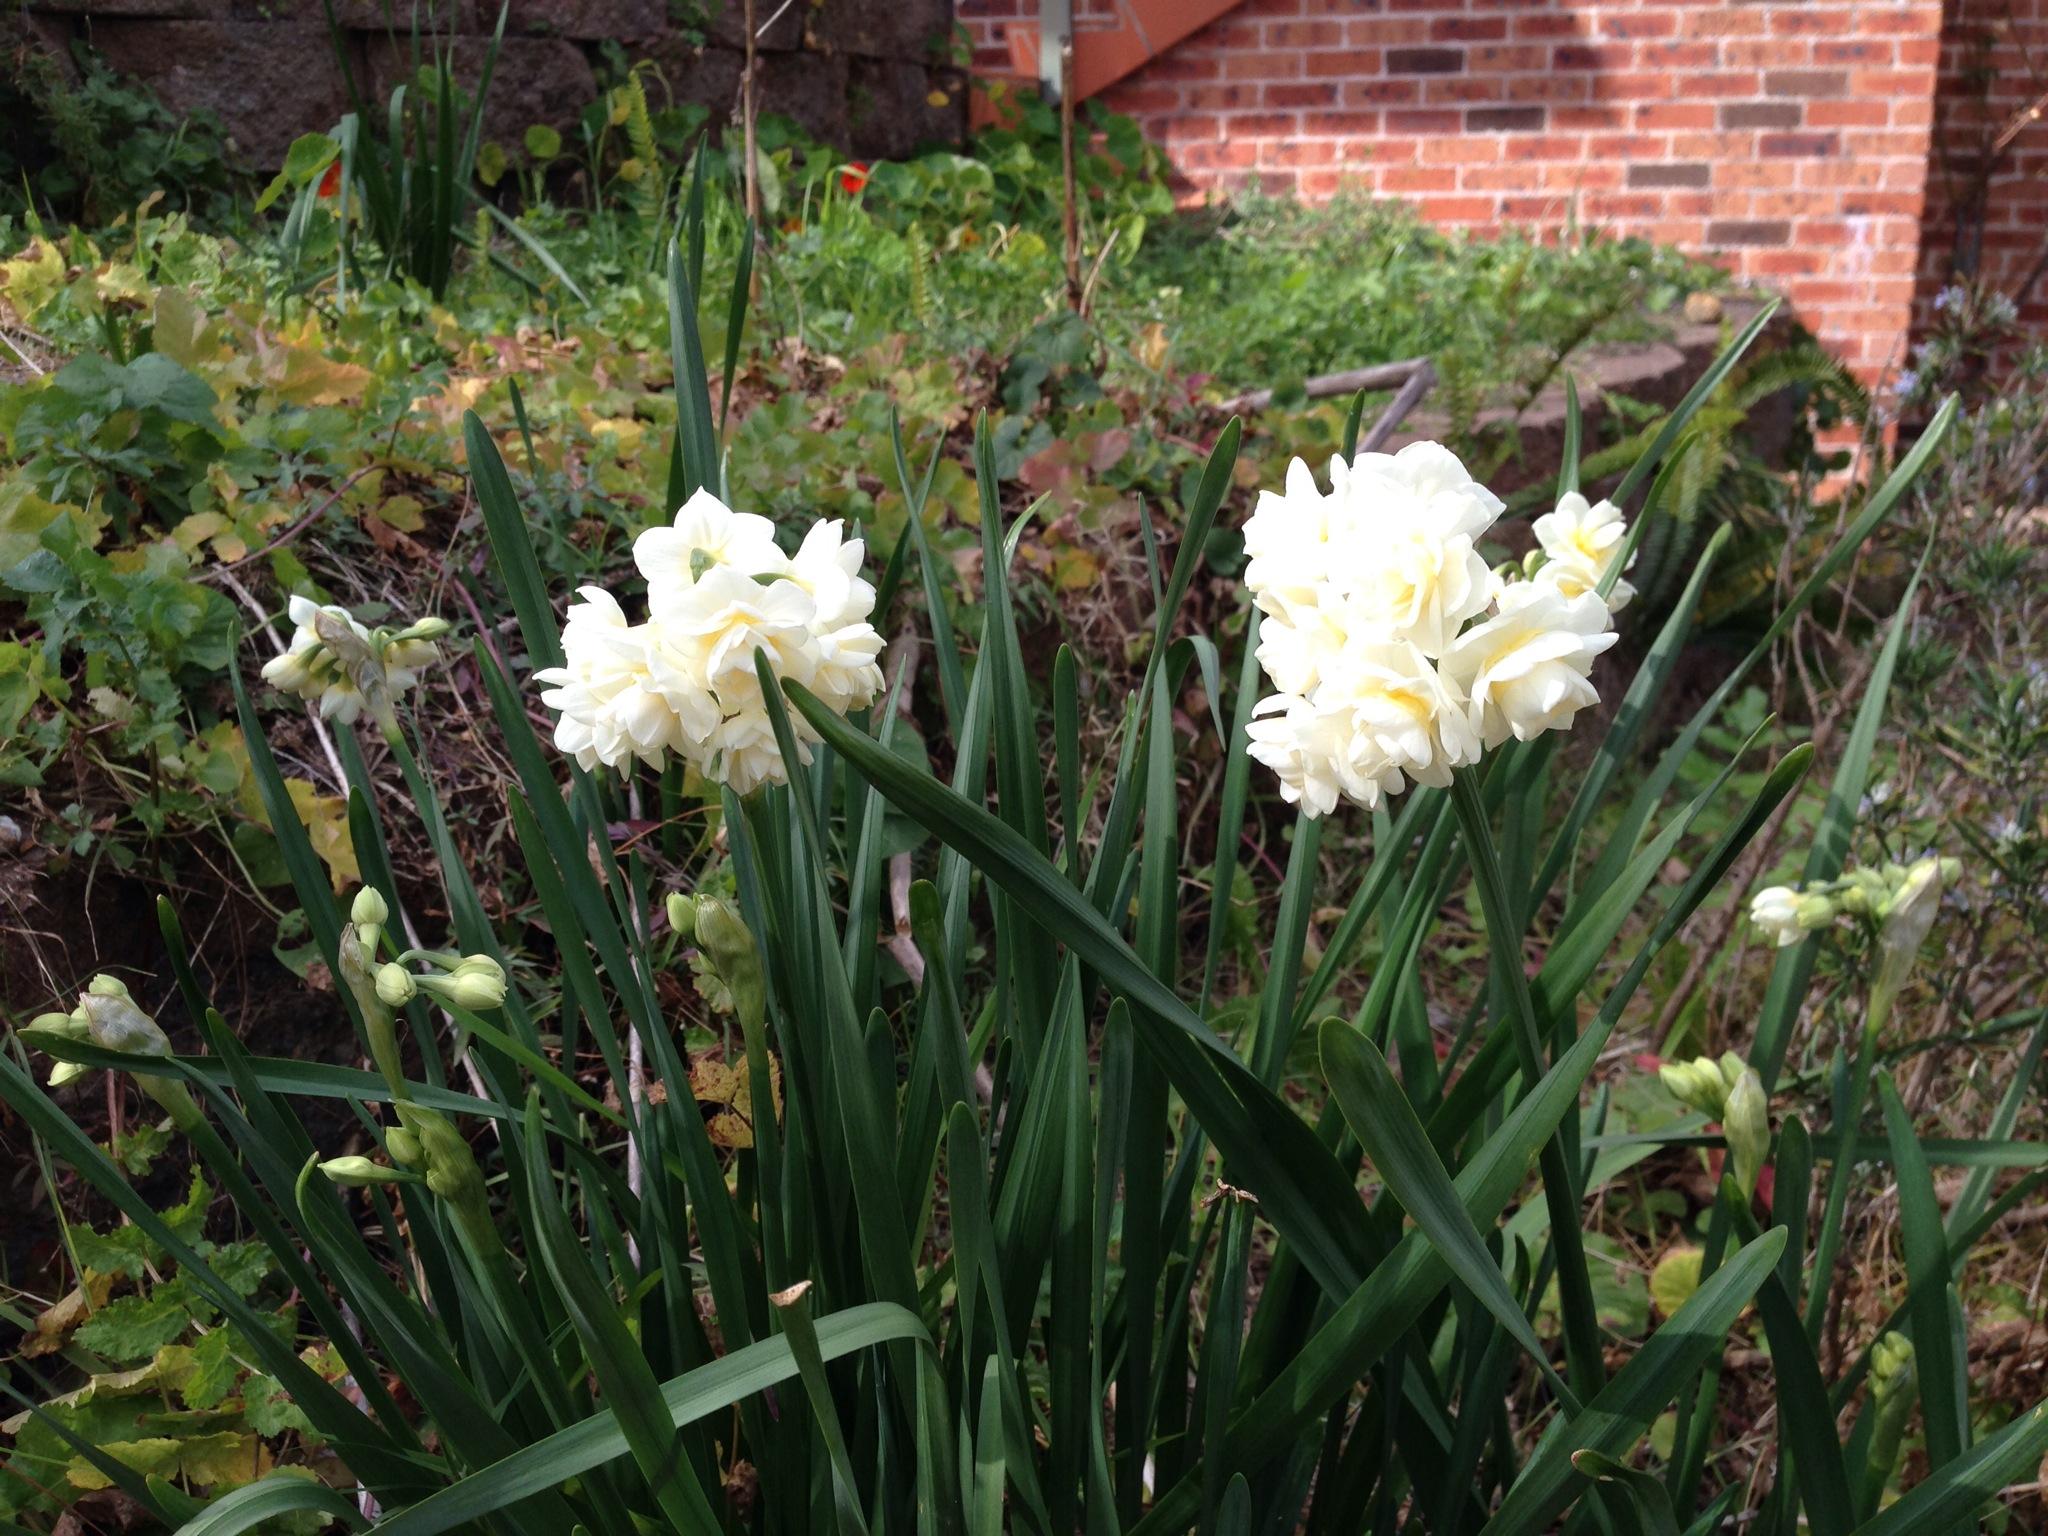 Jonquils are flowering